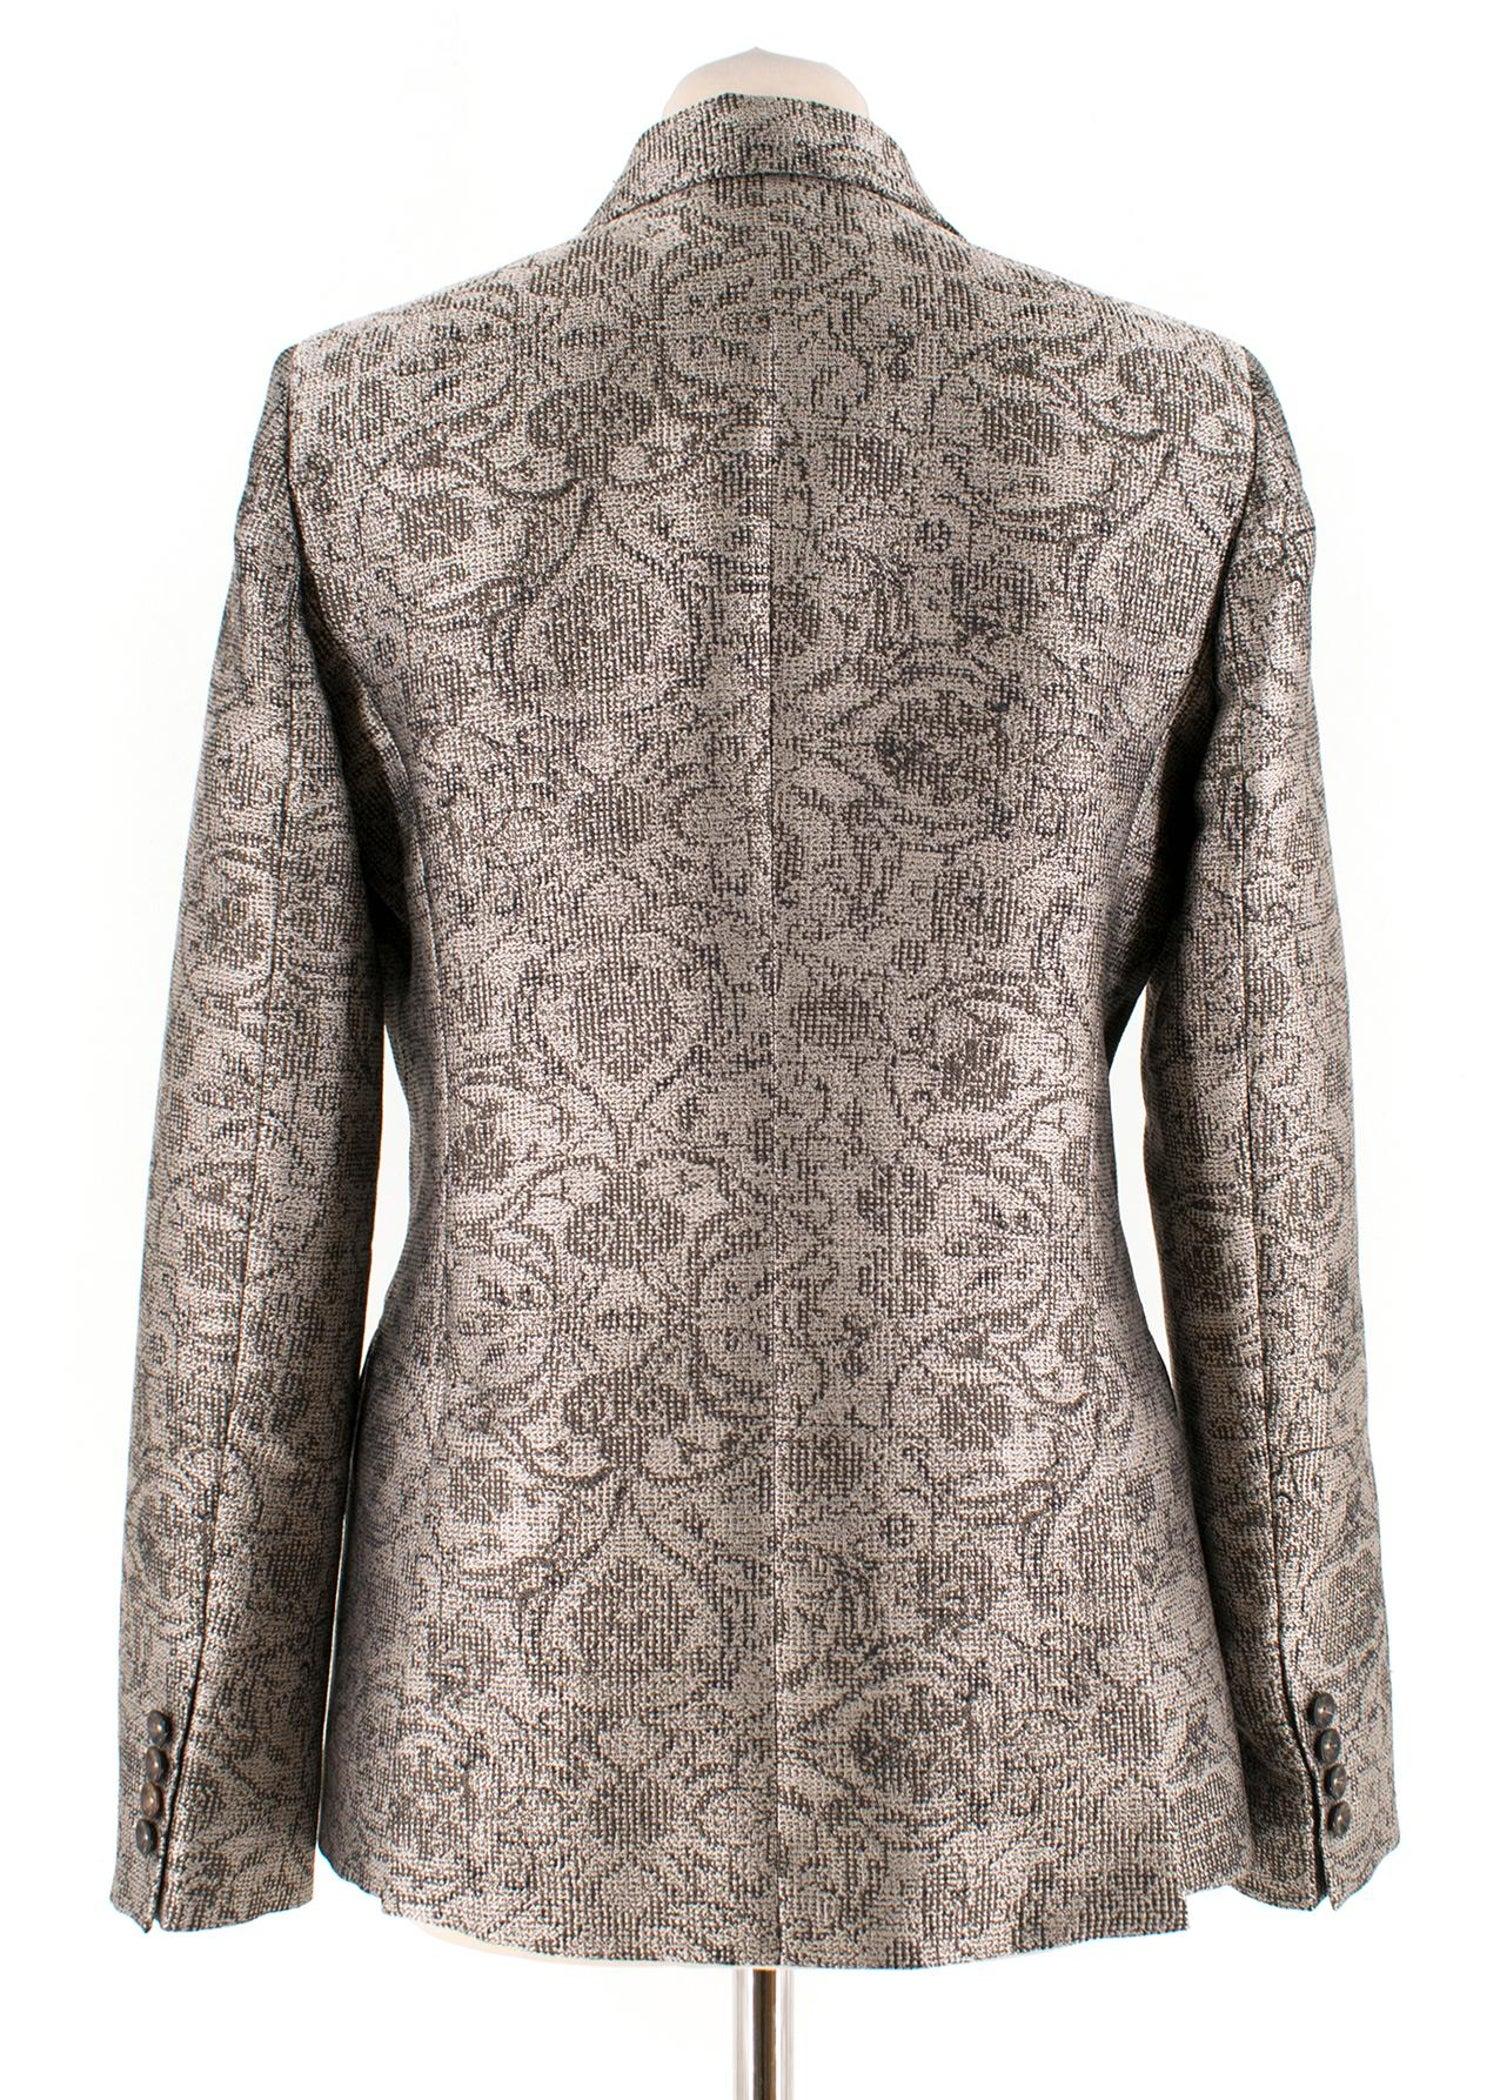 708ab2fe32ca1f Max Mara single-breasted baroque-jacquard jacket US 6 For Sale at 1stdibs